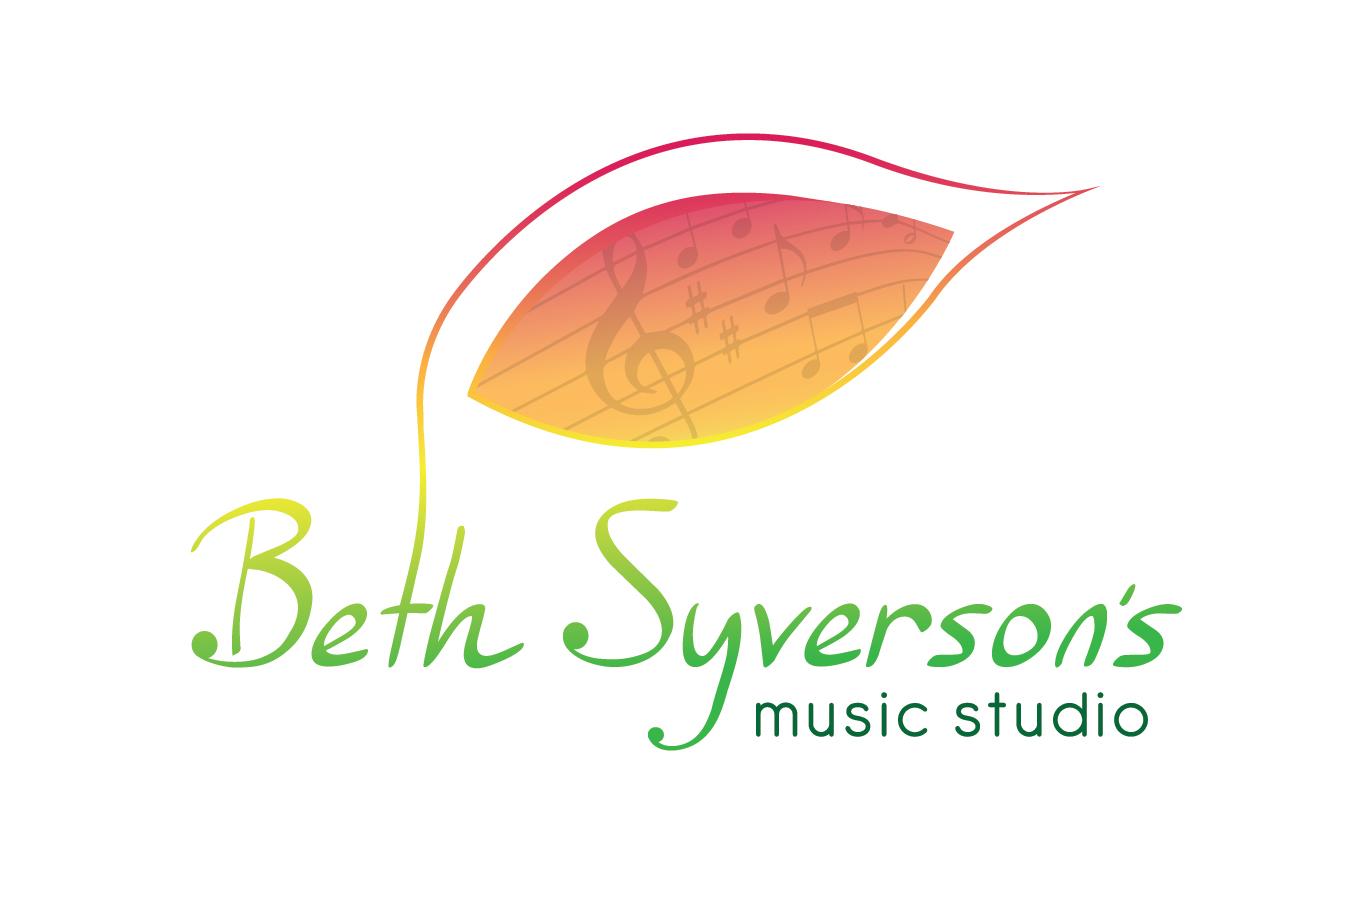 Beth Syverson's Music Studio